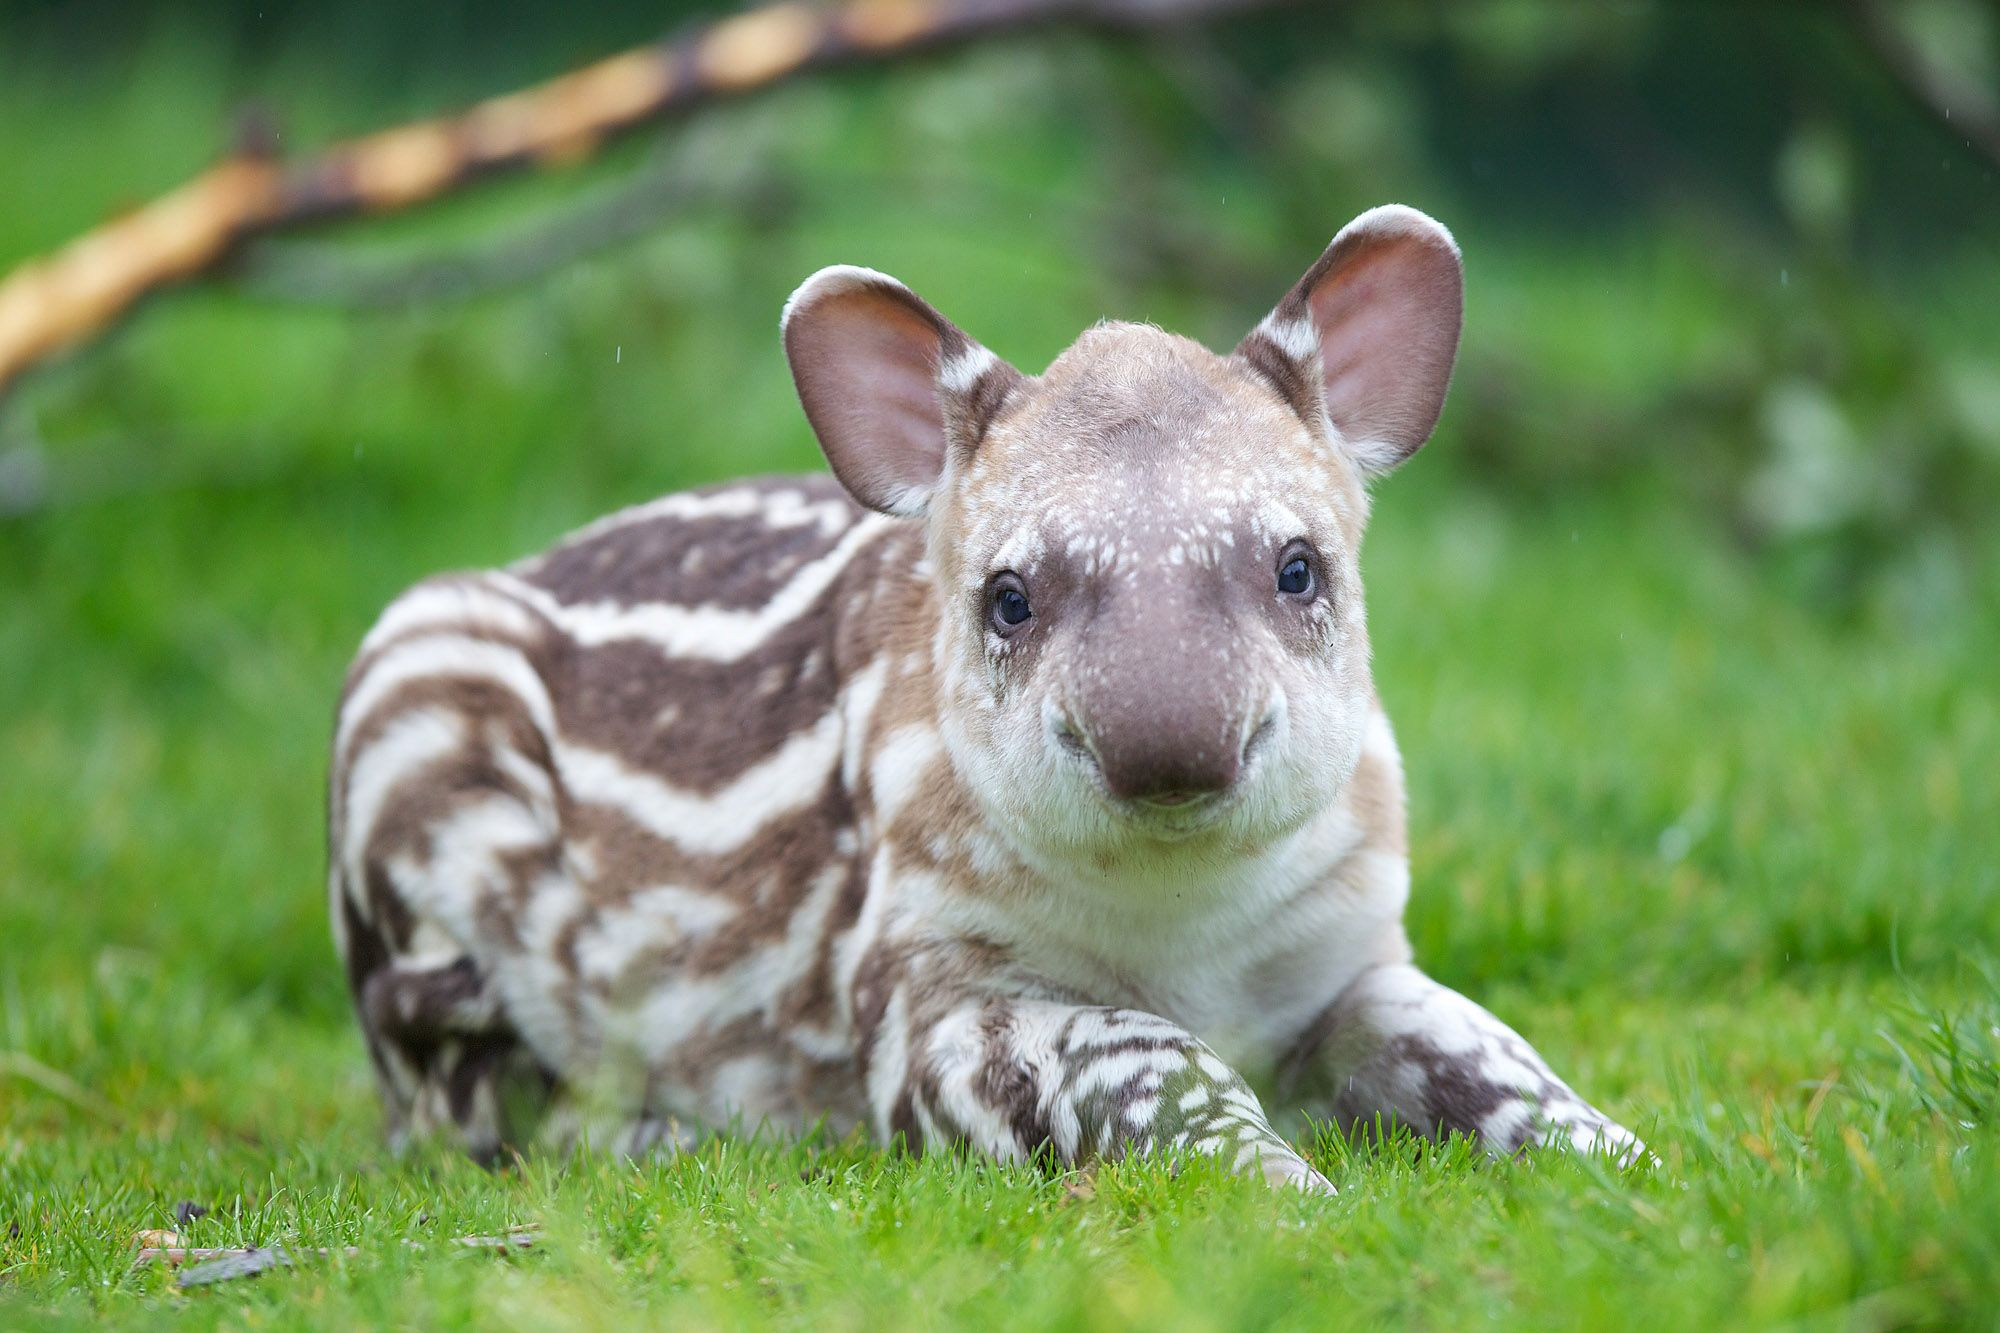 Rio And Marmaduke Celebrate Their First Born At Dublin Zoo Tapir Calf Born Entertainment Ie Animals Cute Animals Cute Baby Animals